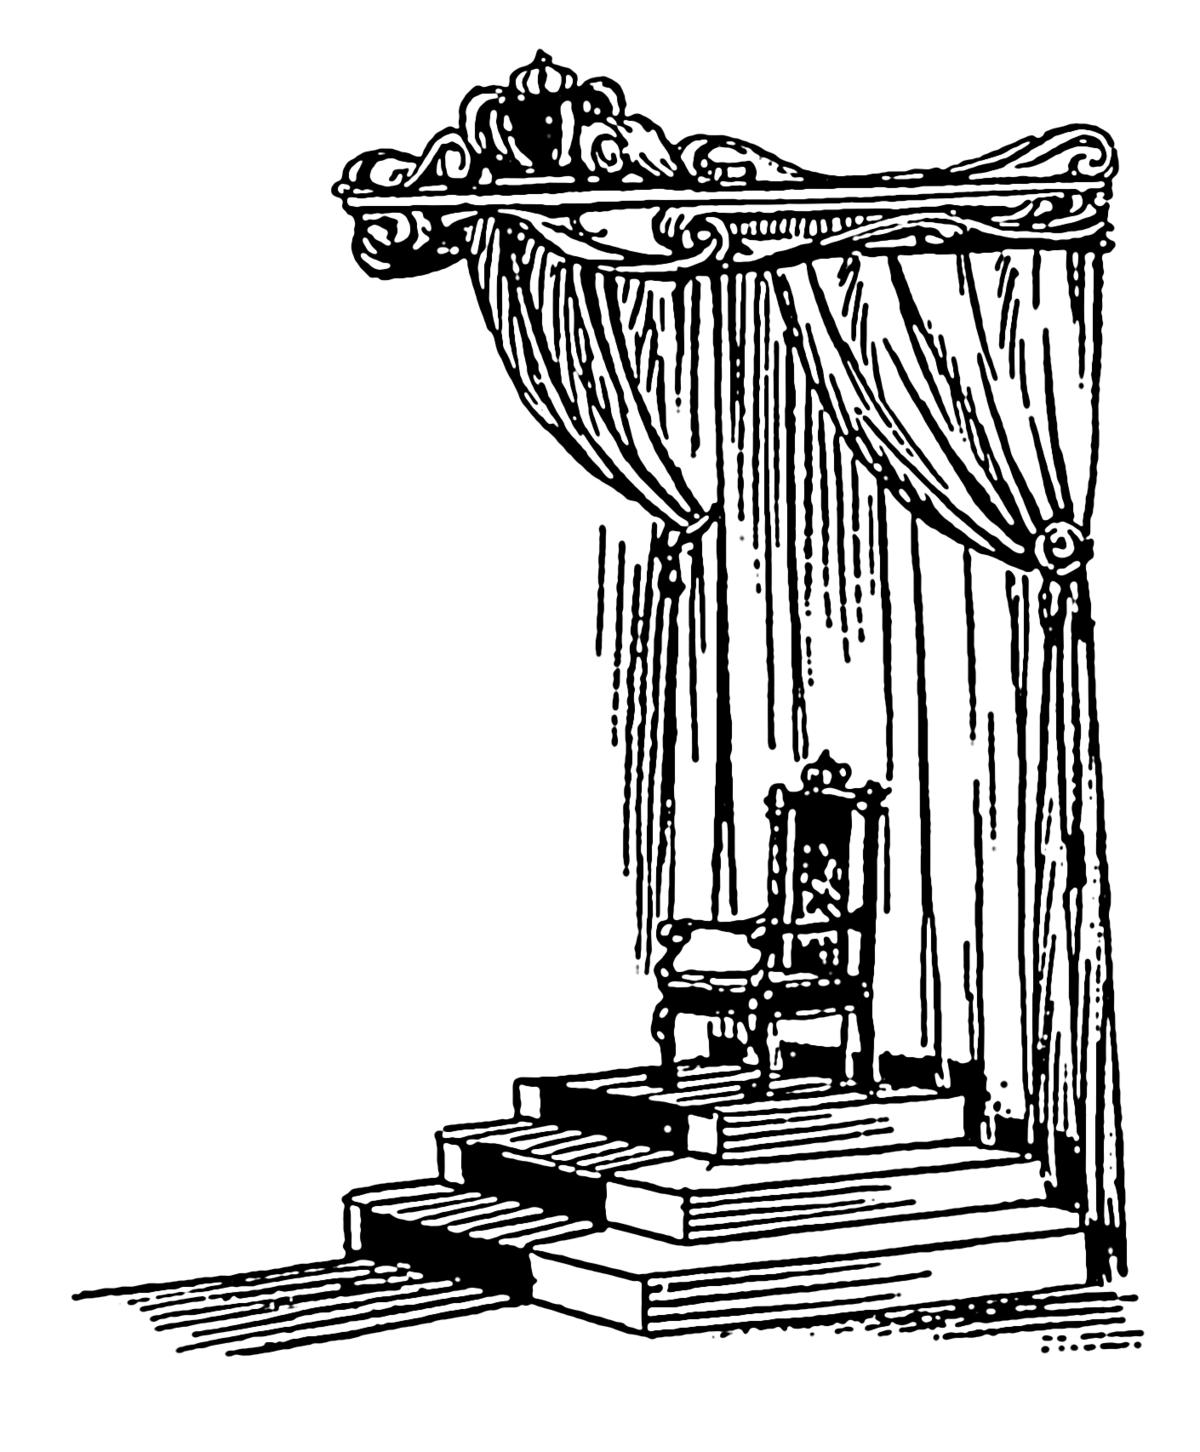 throne wikipedia. Black Bedroom Furniture Sets. Home Design Ideas